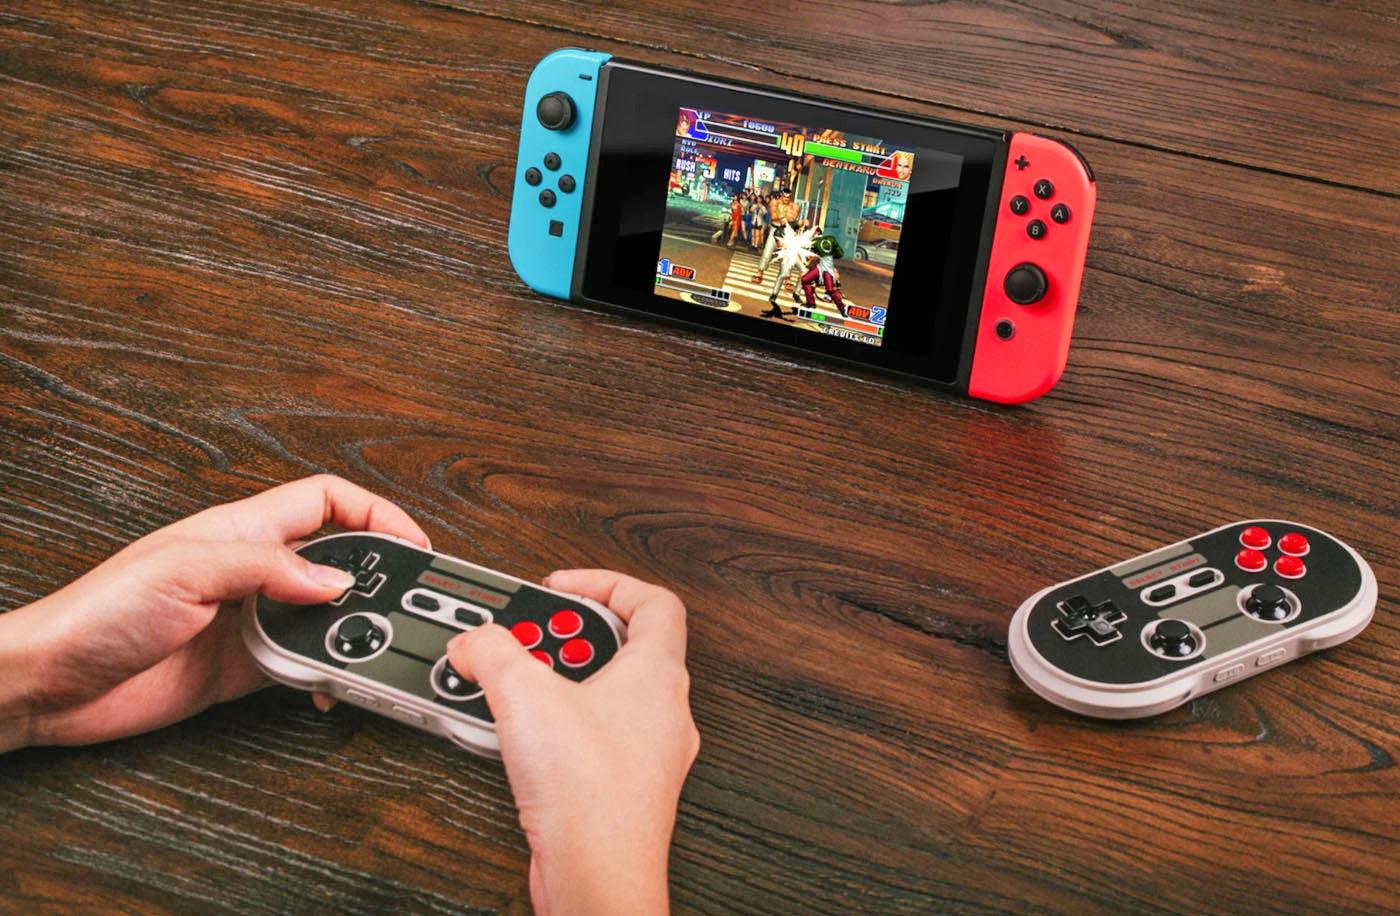 Nintendo's Switch has a retro gamepad option thanks to